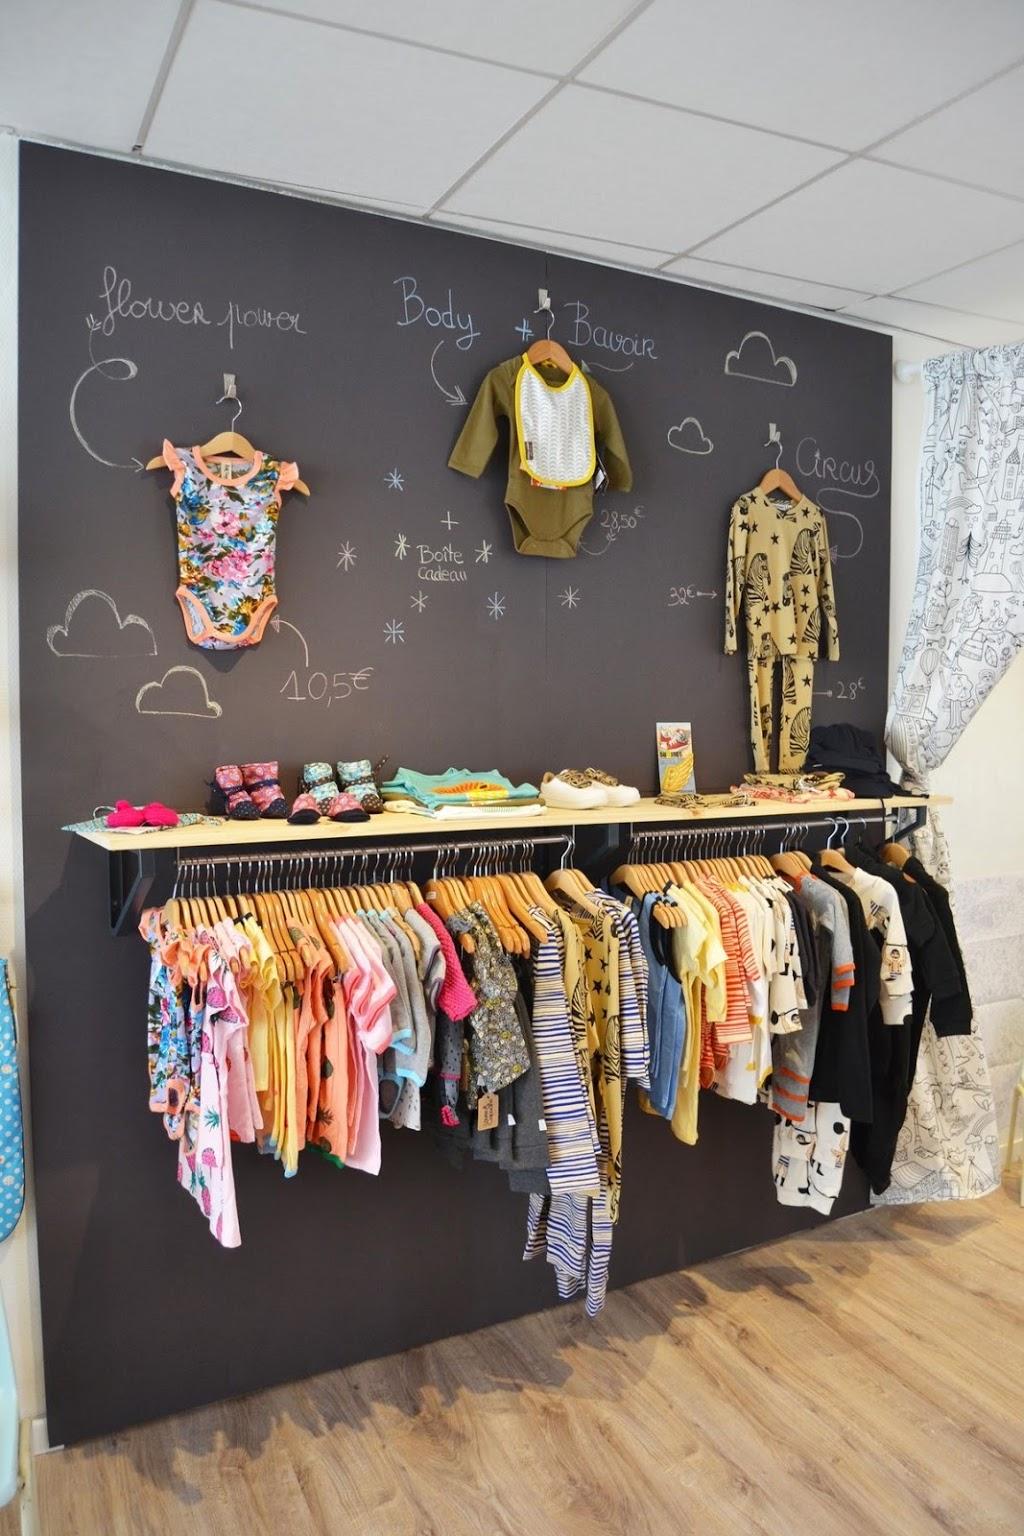 Friperie belle aventure | store | 1516 Rue du Curé-Guay, LeMoyne, QC J4P 2B4, Canada | 4509991946 OR +1 450-999-1946